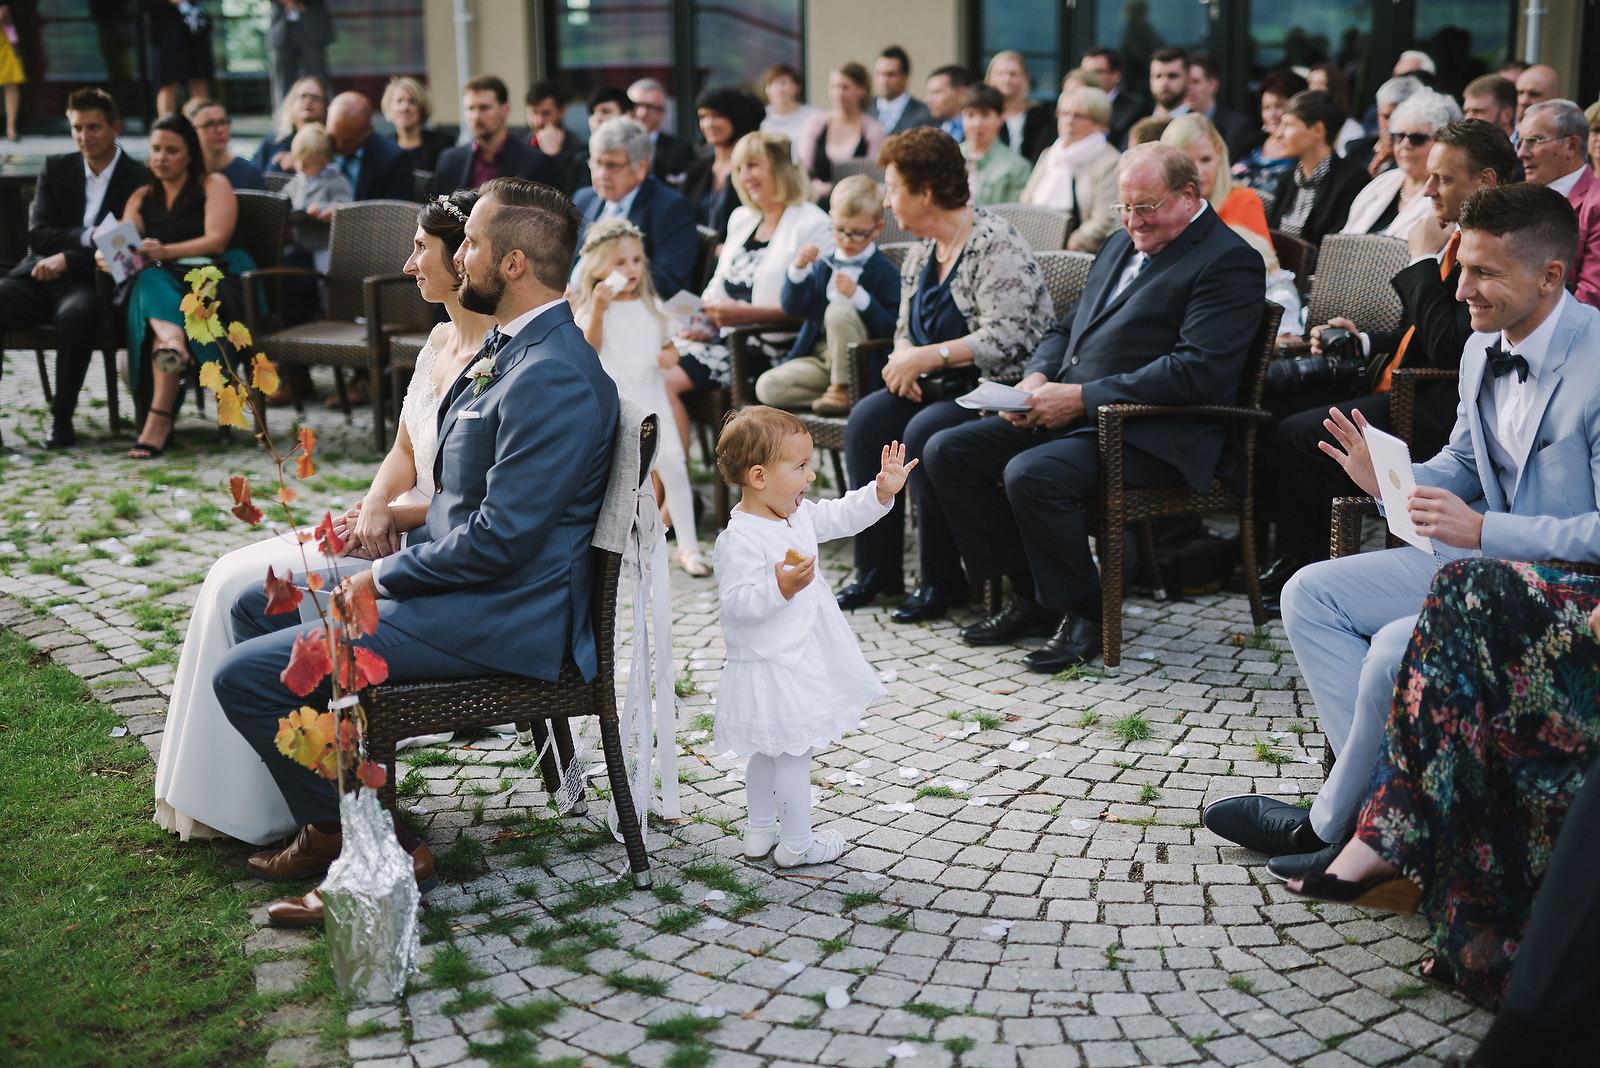 Fotograf Konstanz - Hochzeitsfotograf Reutlingen Achalm Hochzeit EFP 59 - Als Hochzeitsfotograf auf der Achalm, Reutlingen  - 48 -